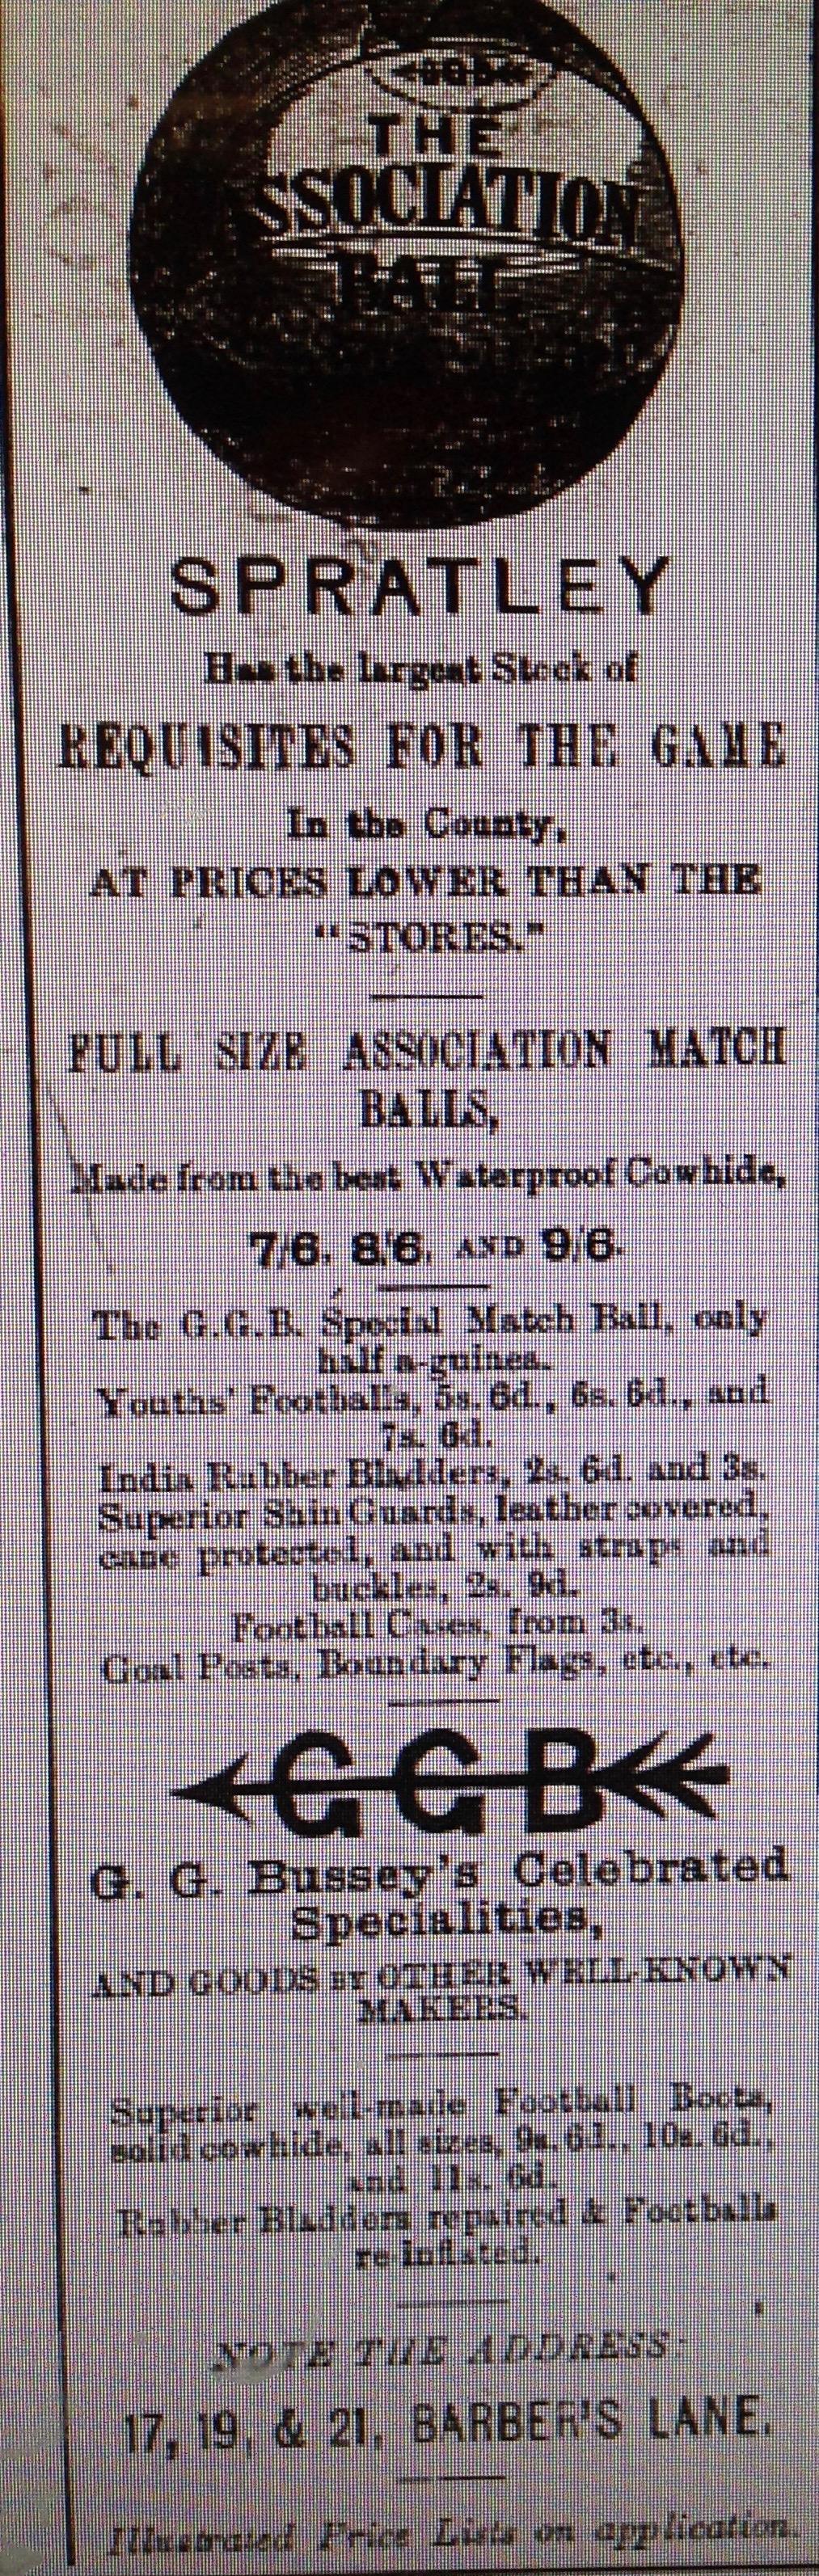 Spratley's advert 1886